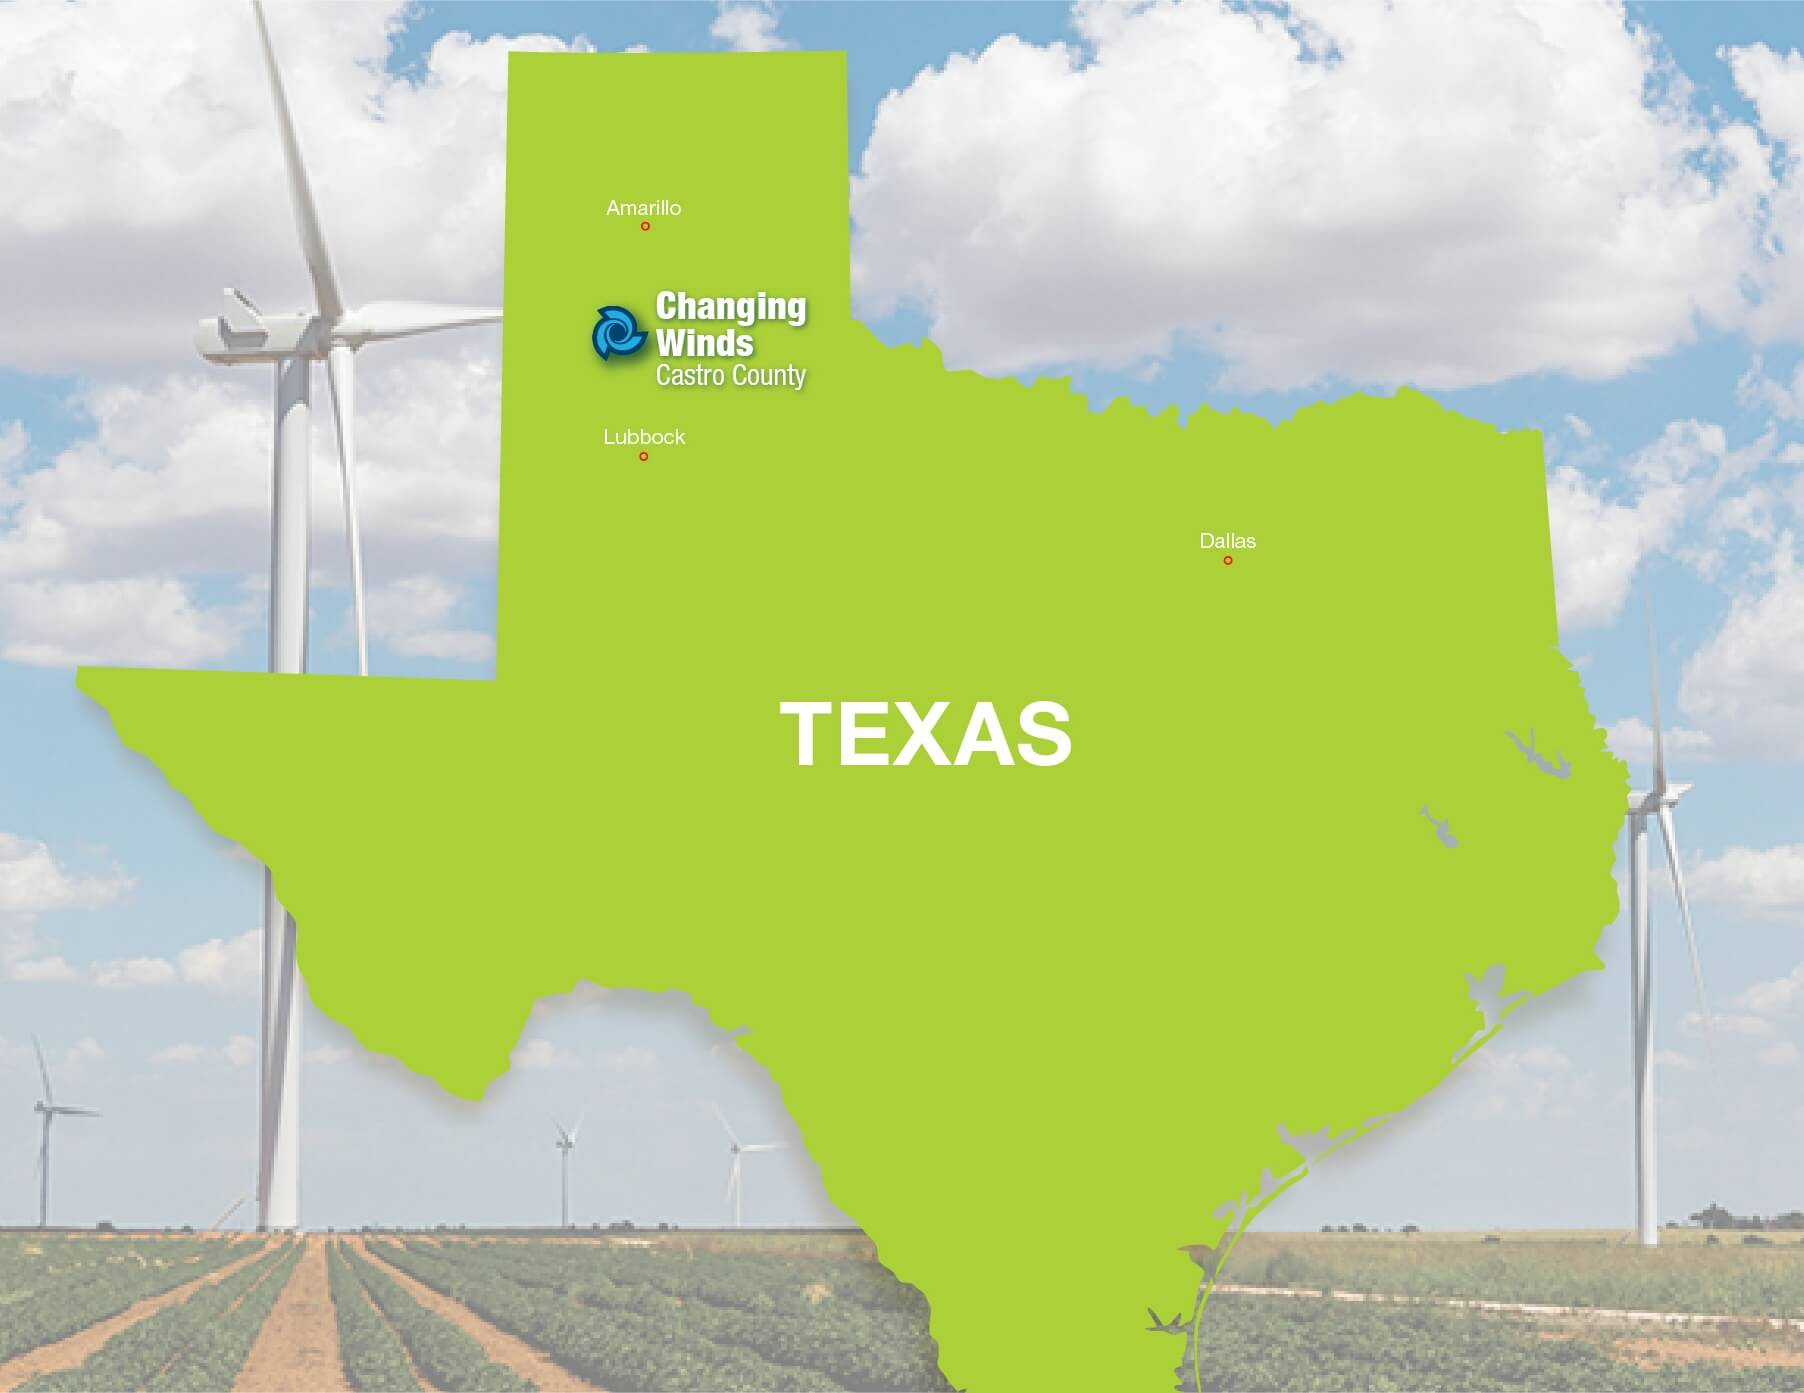 Tri Global Sells Texas Panhandle Wind Farm To Invenergy